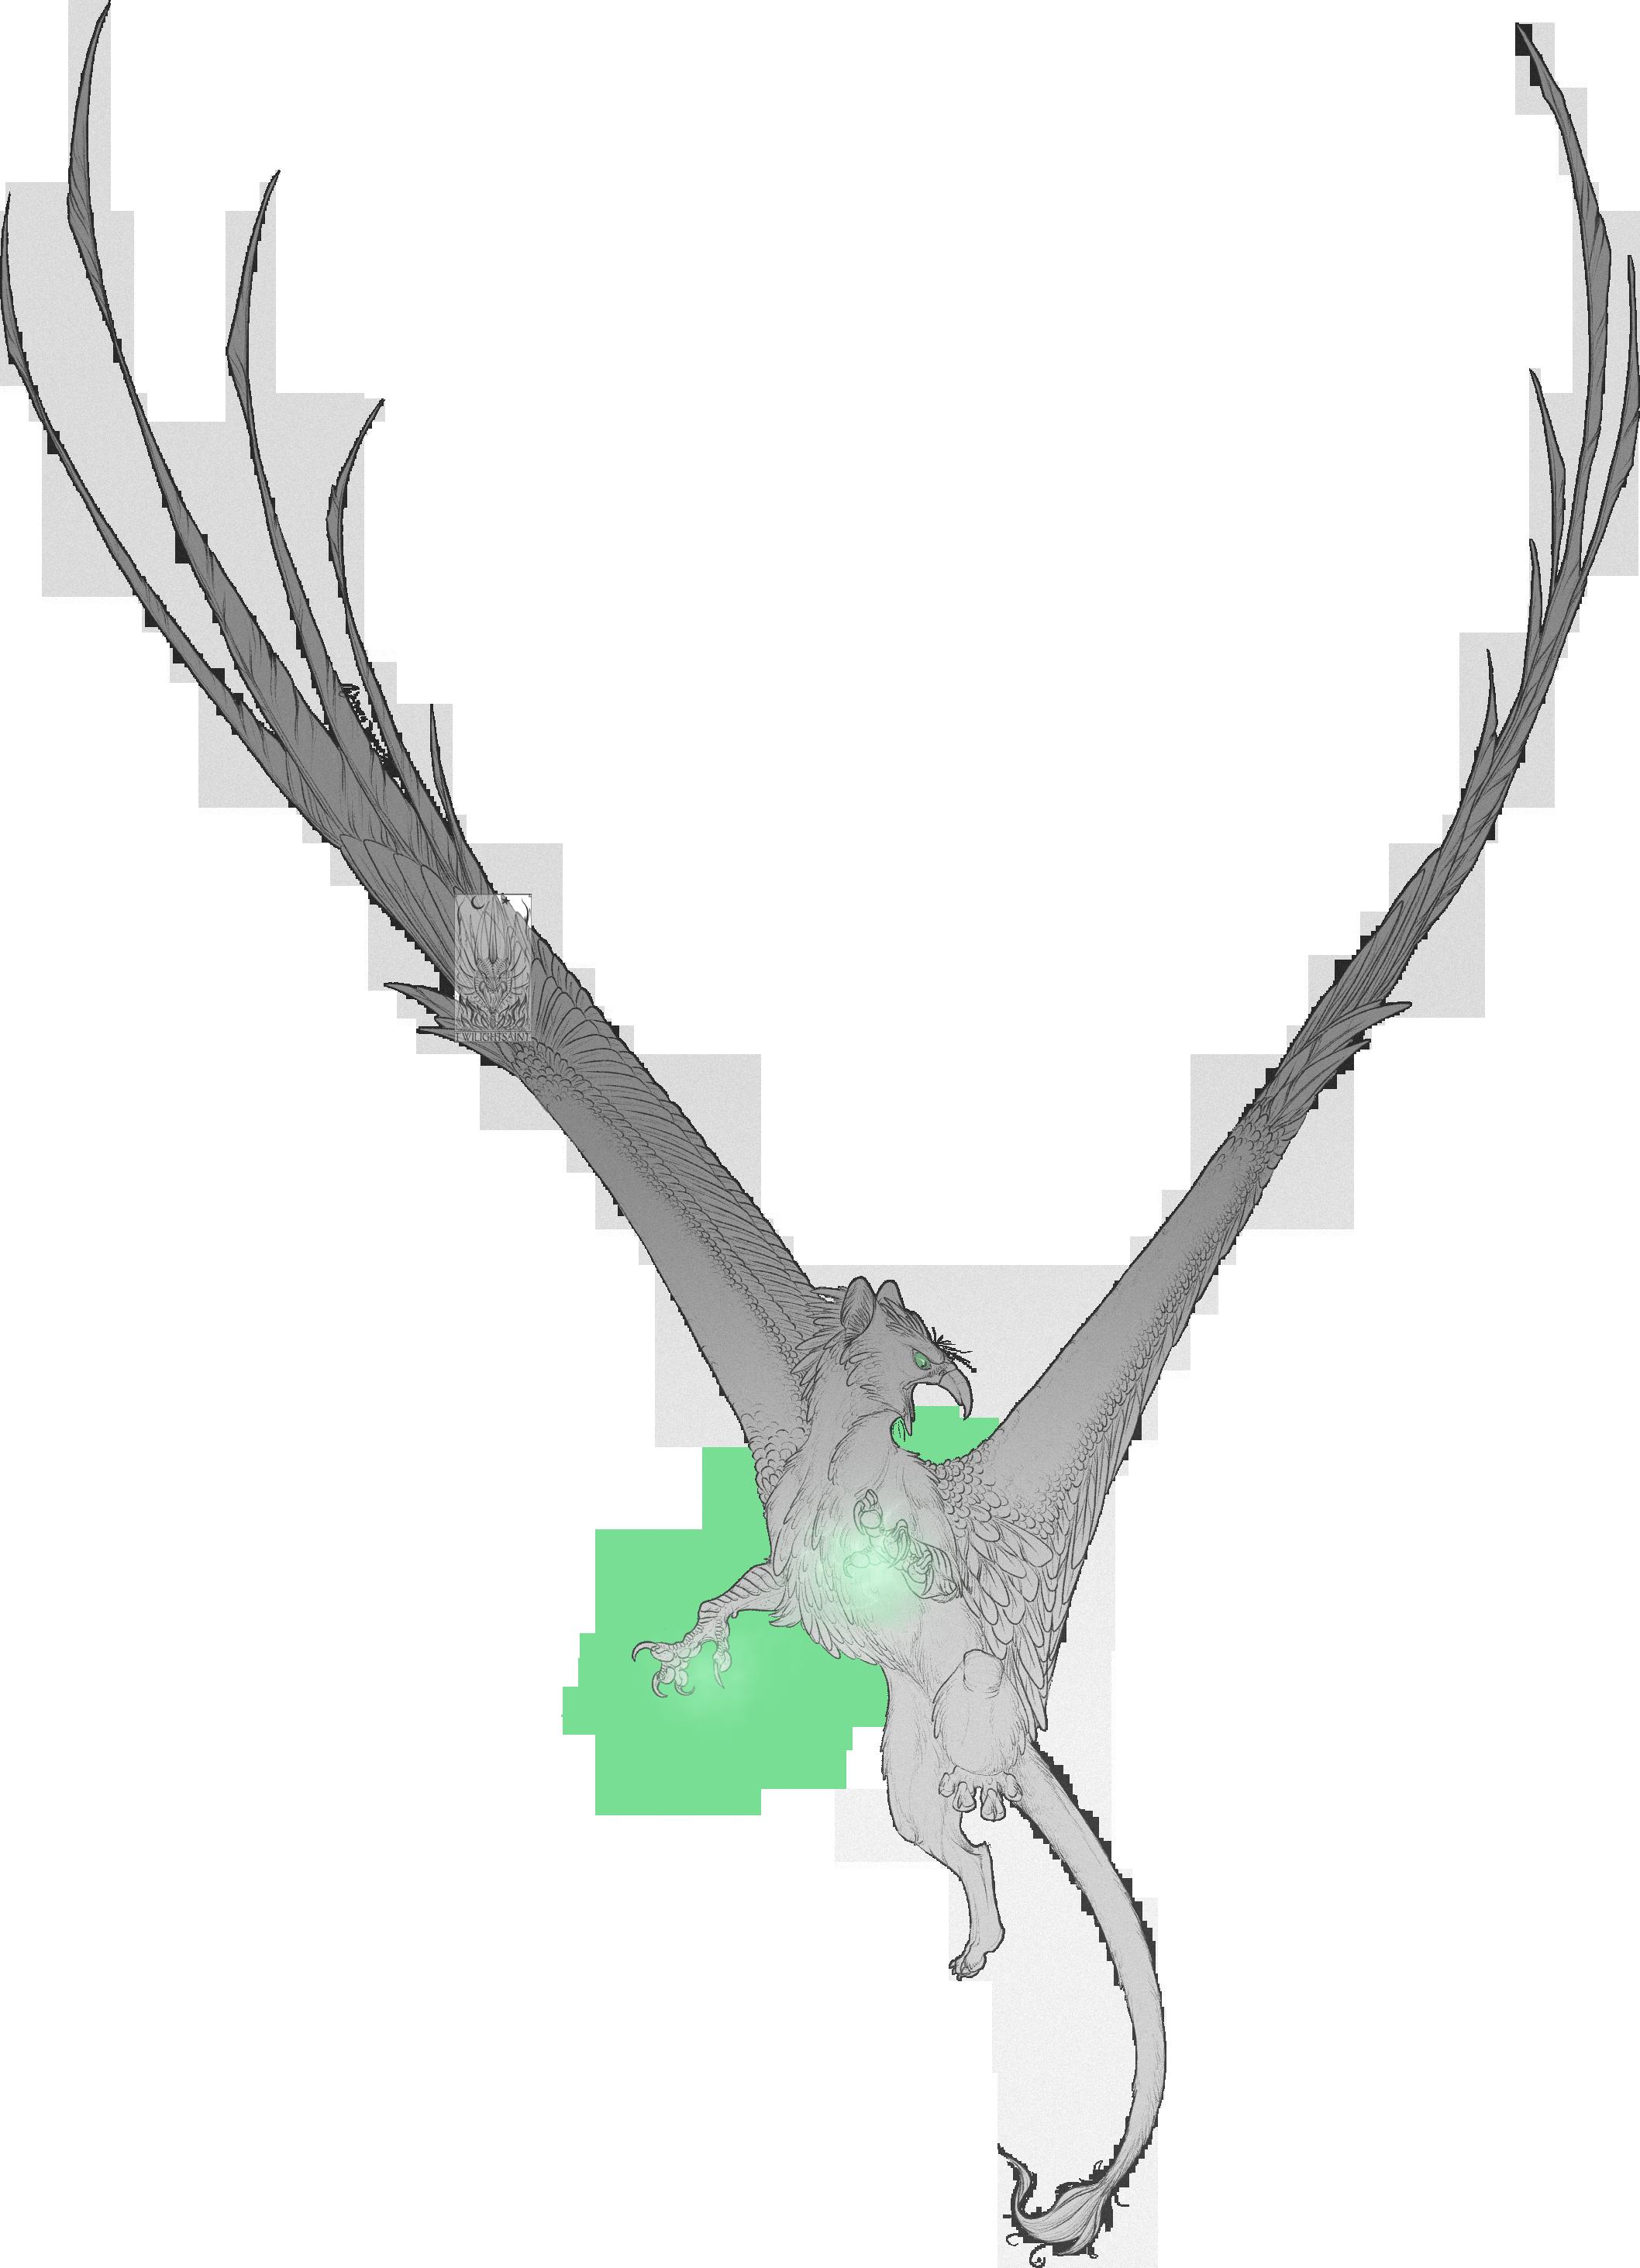 Sketch Comish Enchanted Talons Weasyl